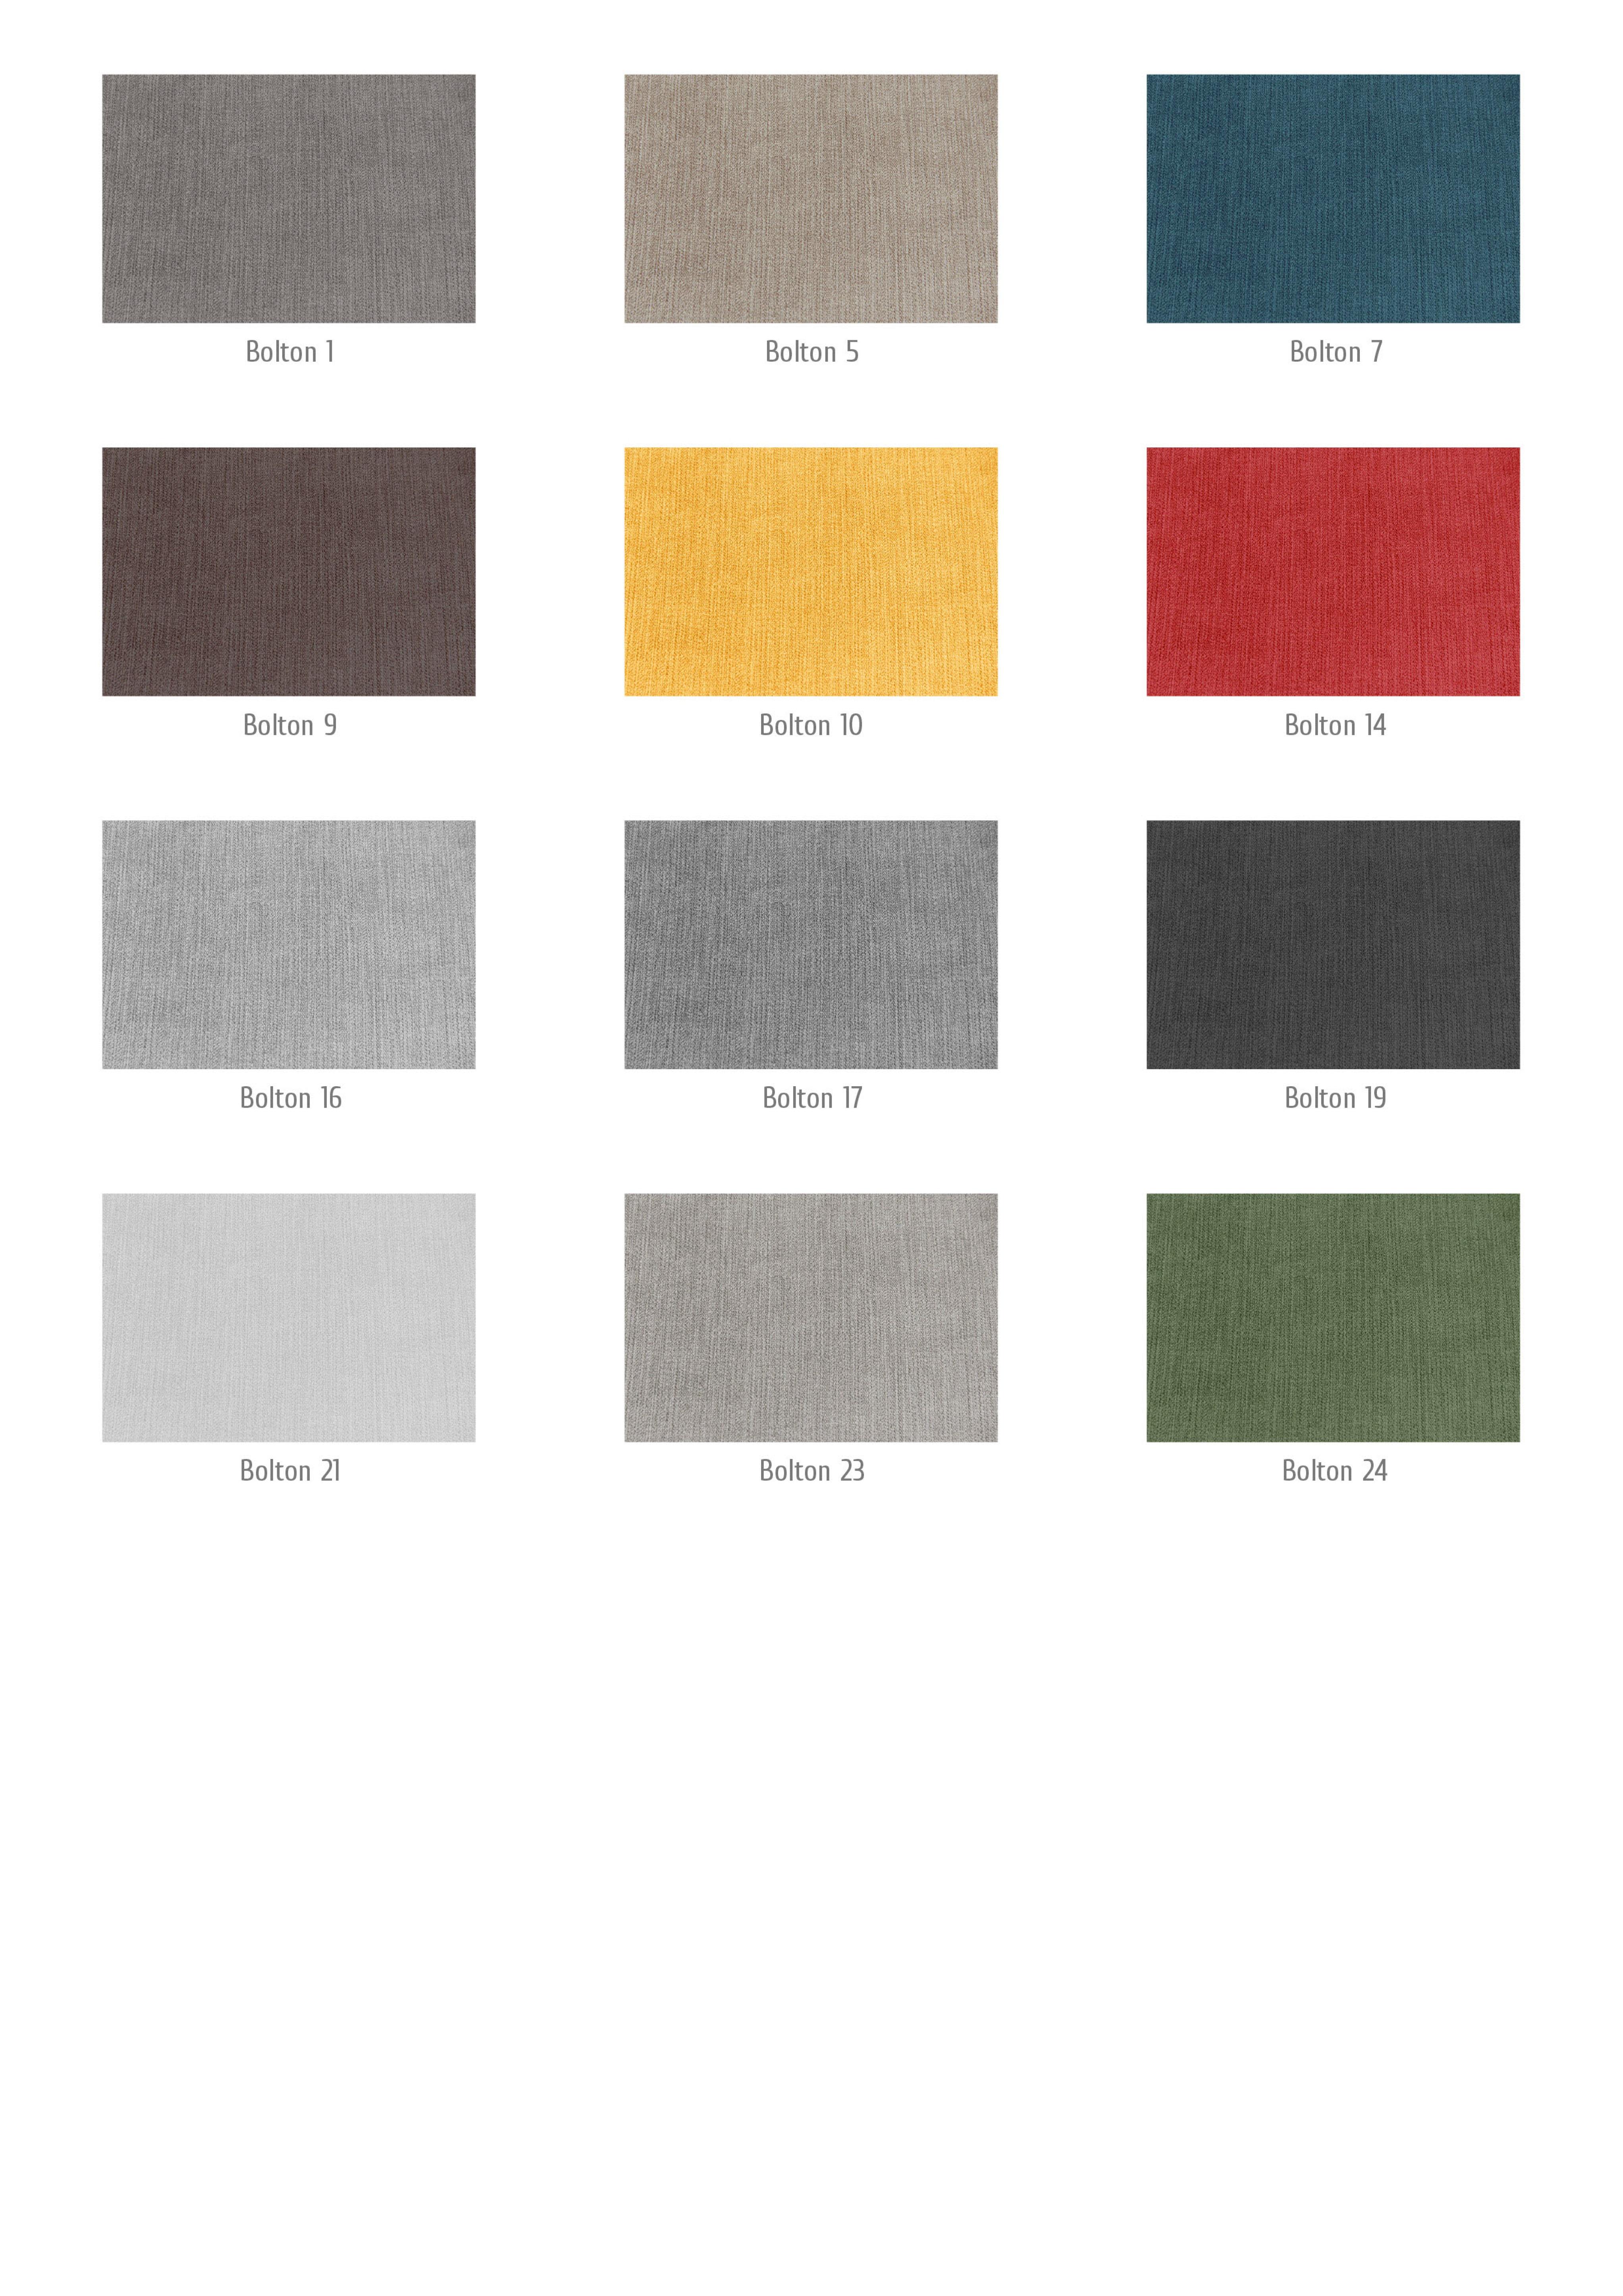 Bolton színek